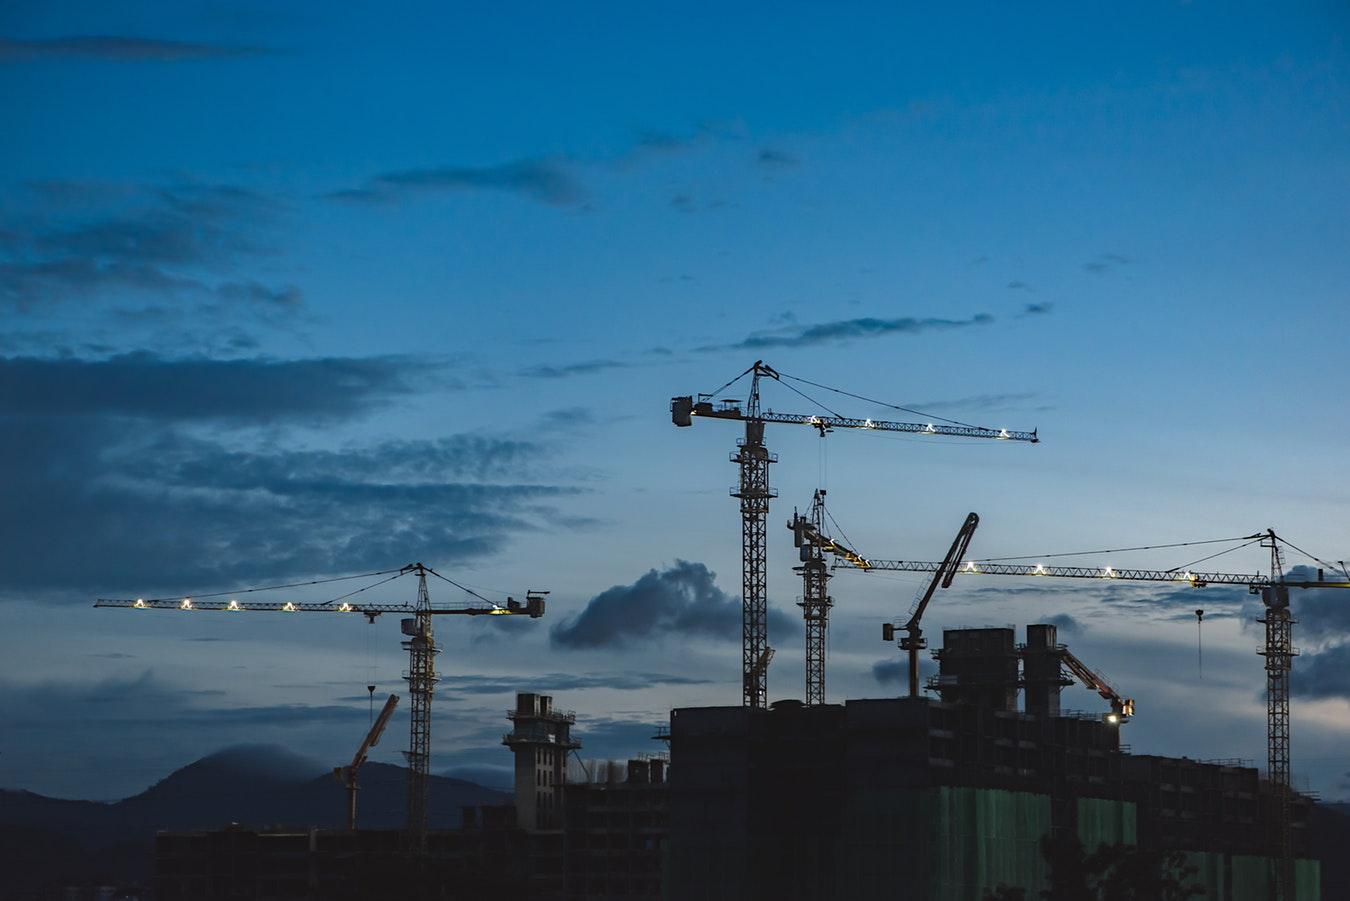 cranes nighttime.jpeg